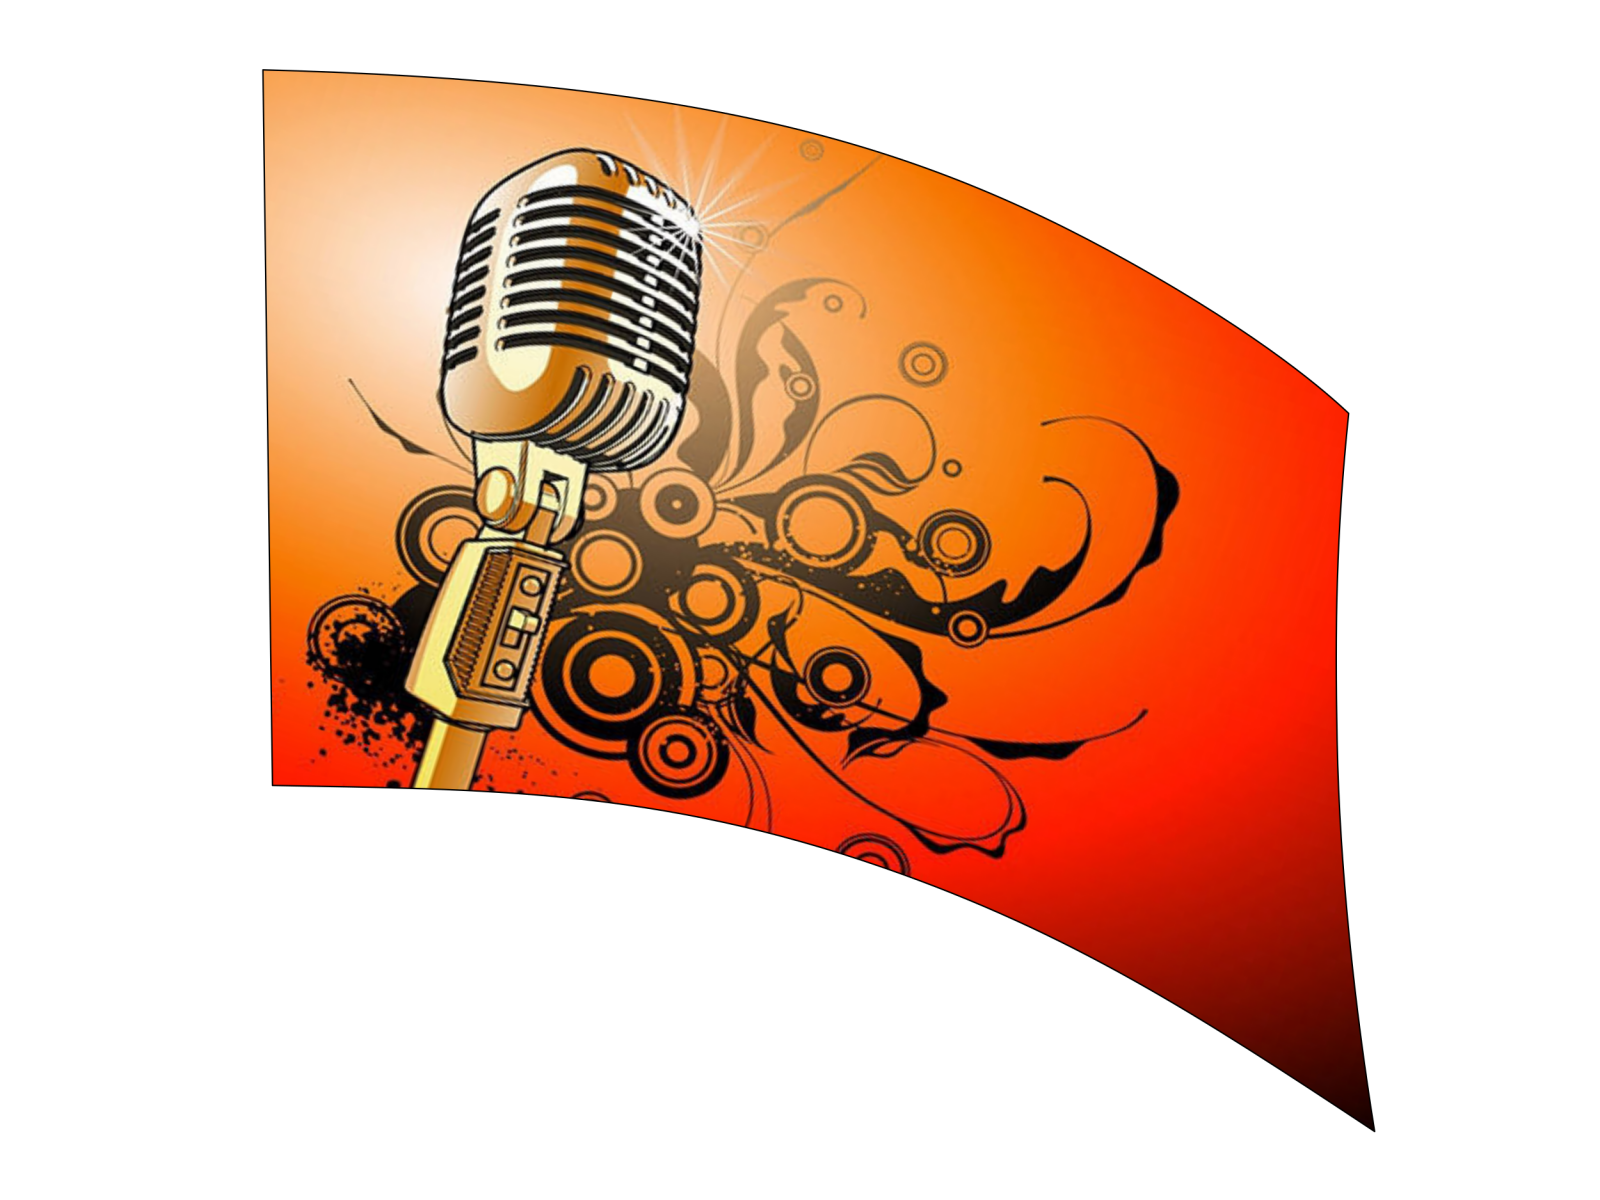 060402s - 36x52 Standard Microphone 1